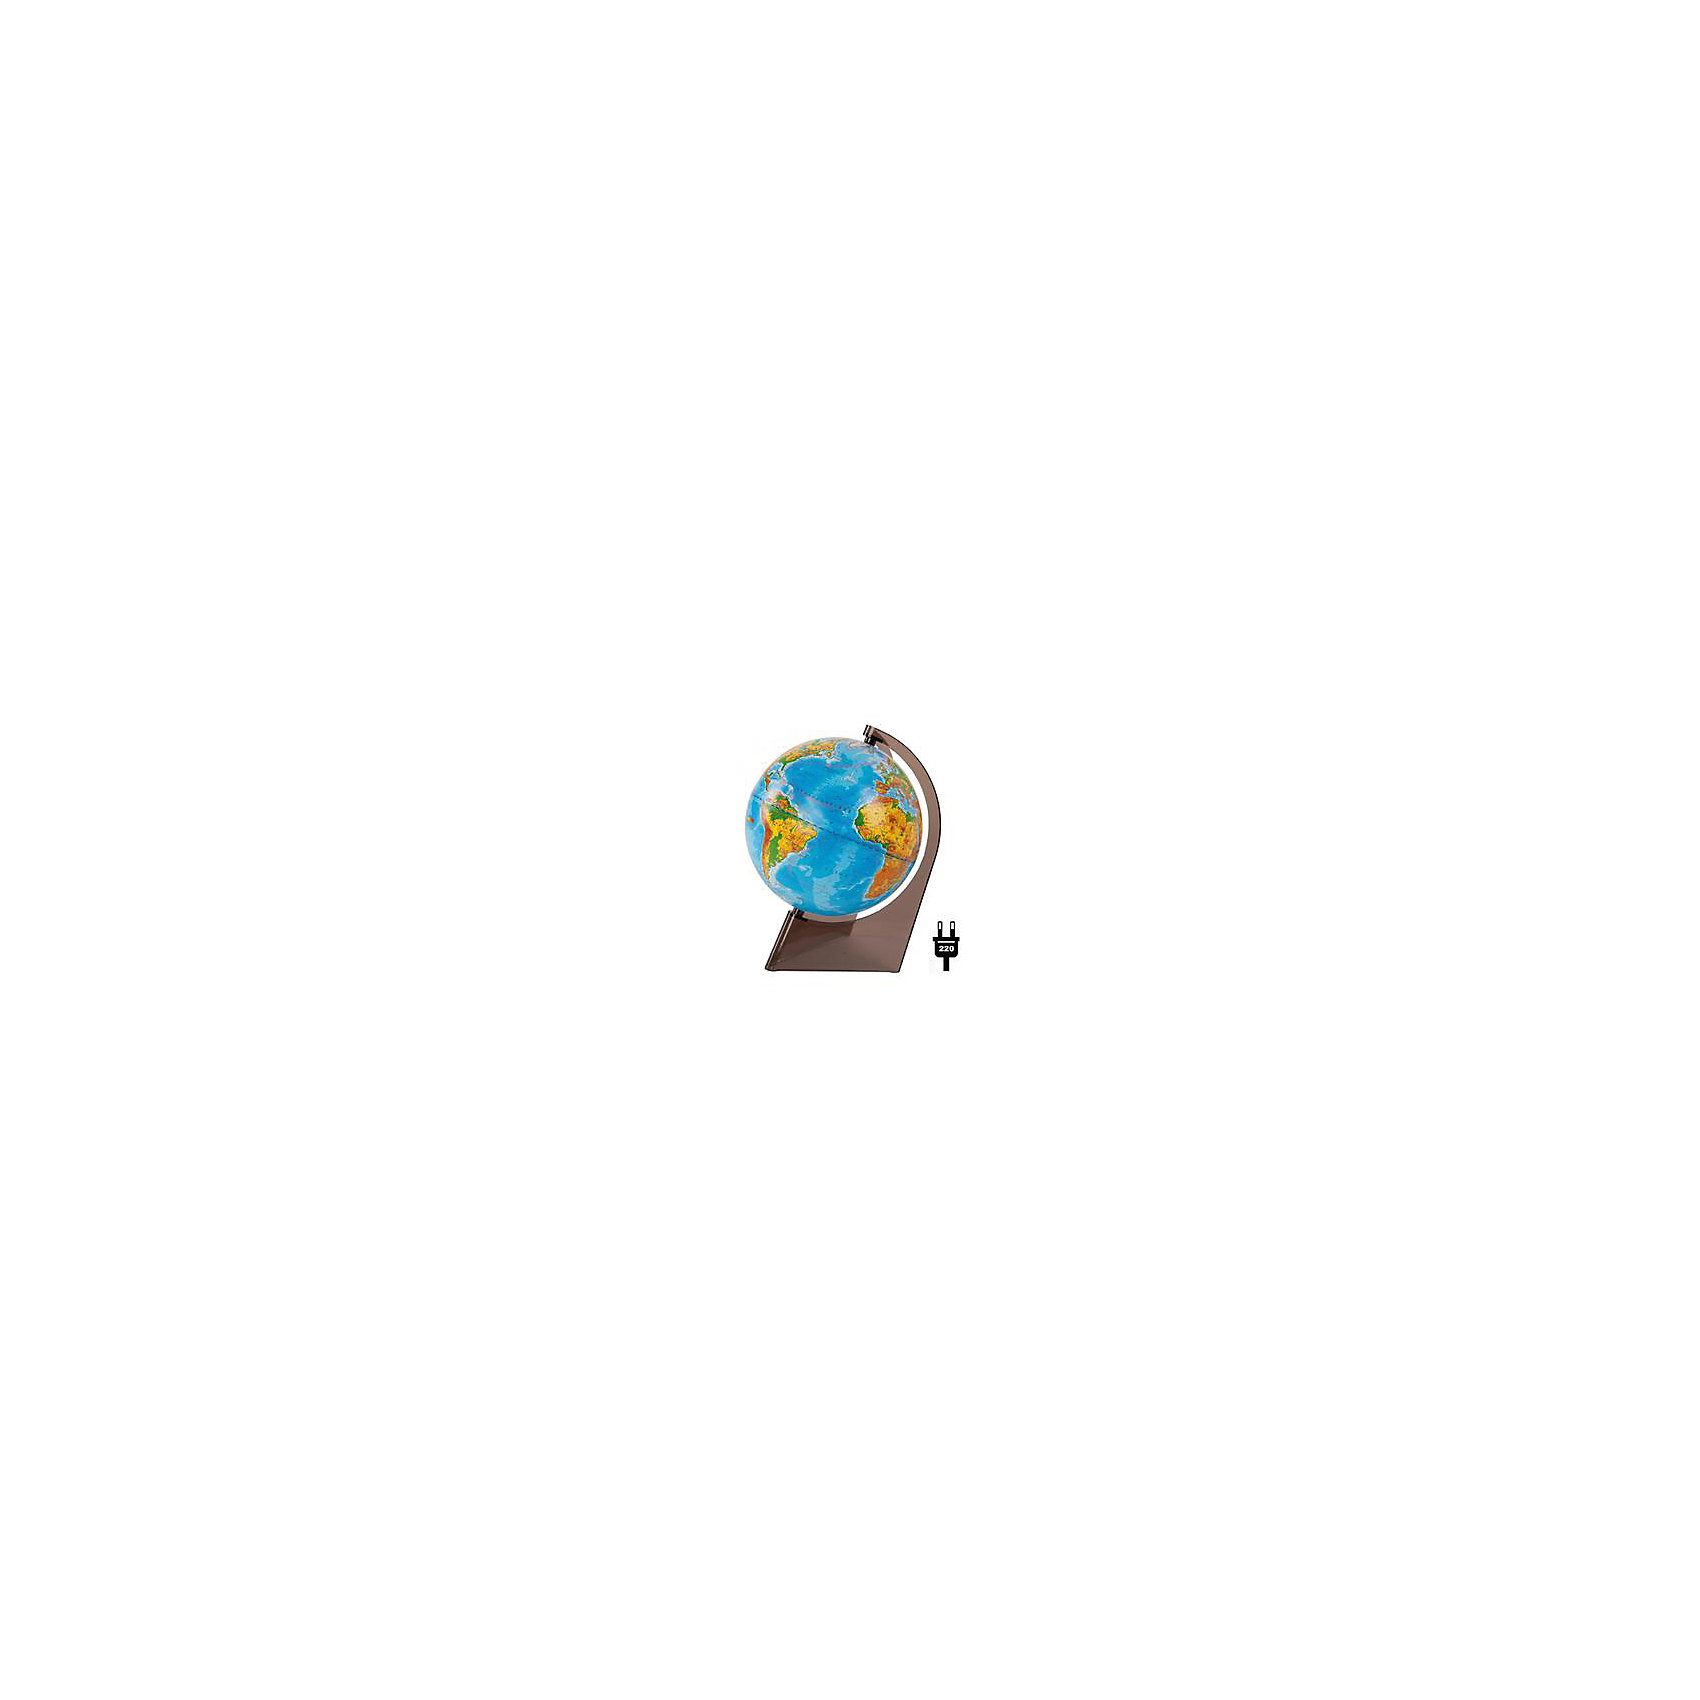 Глобус Земли физический на треугольнике с подсветкой, диаметр 210 ммДиаметр: 210 мм<br><br>Масштаб: 1:60000000<br><br>Материал подставки: Пластик<br><br>Цвет подставки: Прозрачный<br><br>Ширина мм: 217<br>Глубина мм: 217<br>Высота мм: 315<br>Вес г: 800<br>Возраст от месяцев: 72<br>Возраст до месяцев: 2147483647<br>Пол: Унисекс<br>Возраст: Детский<br>SKU: 5518205